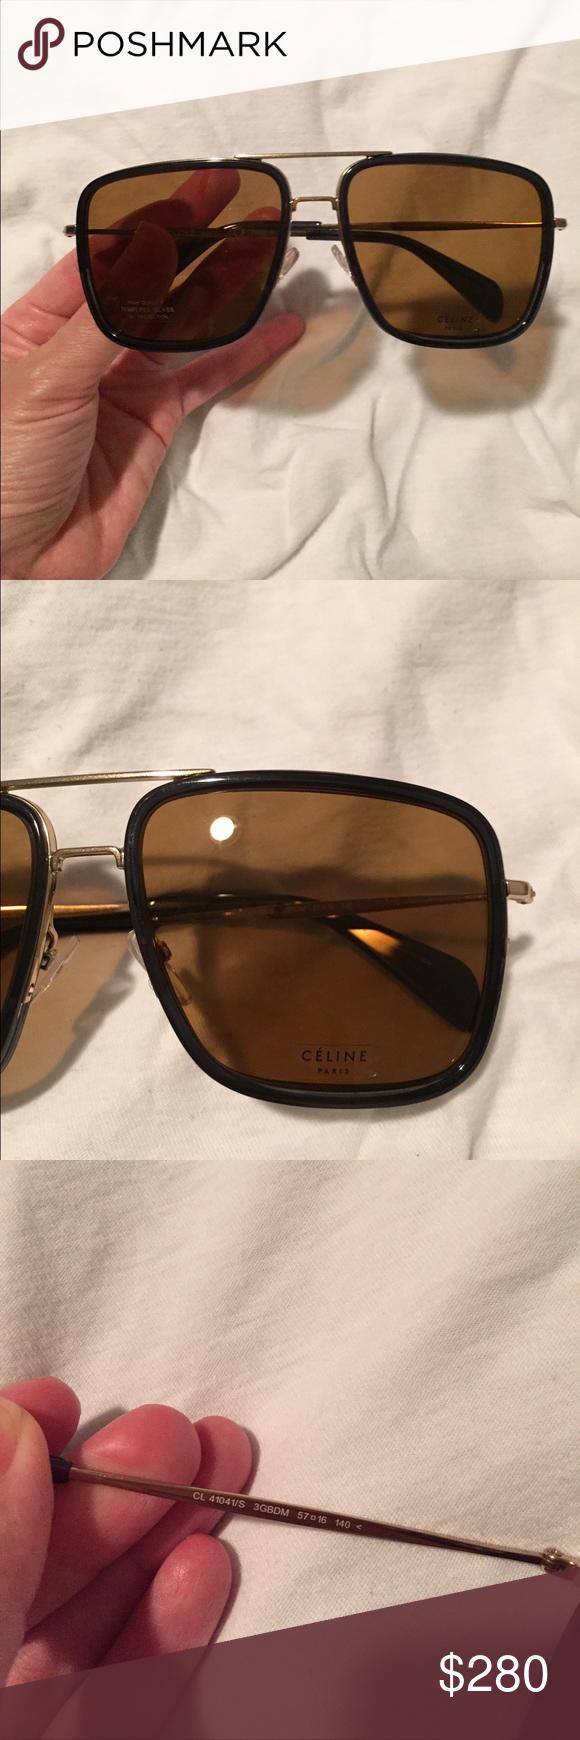 Brand Sunglasses Hamptons Celine New Authentic N0vmwOn8